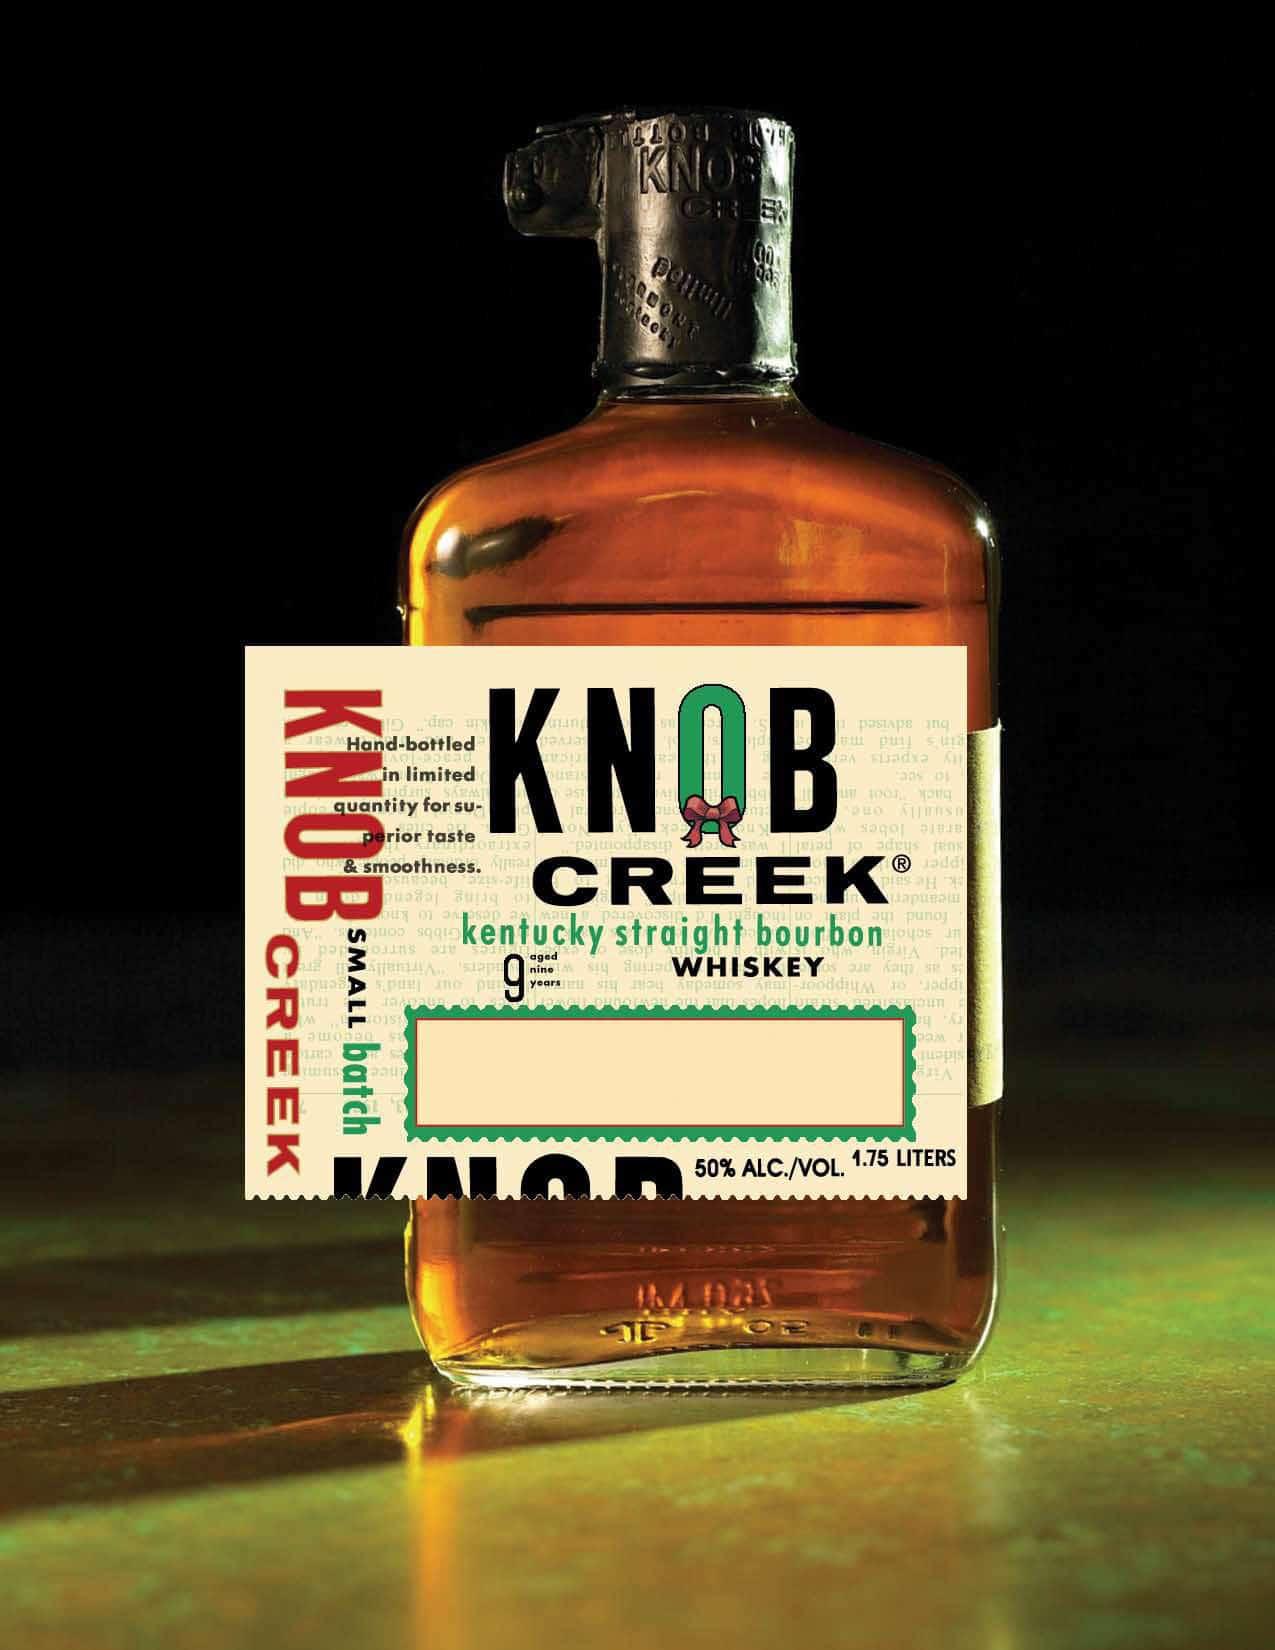 FREE Knob Creek Liquor Bottle Gift Personalized Labels